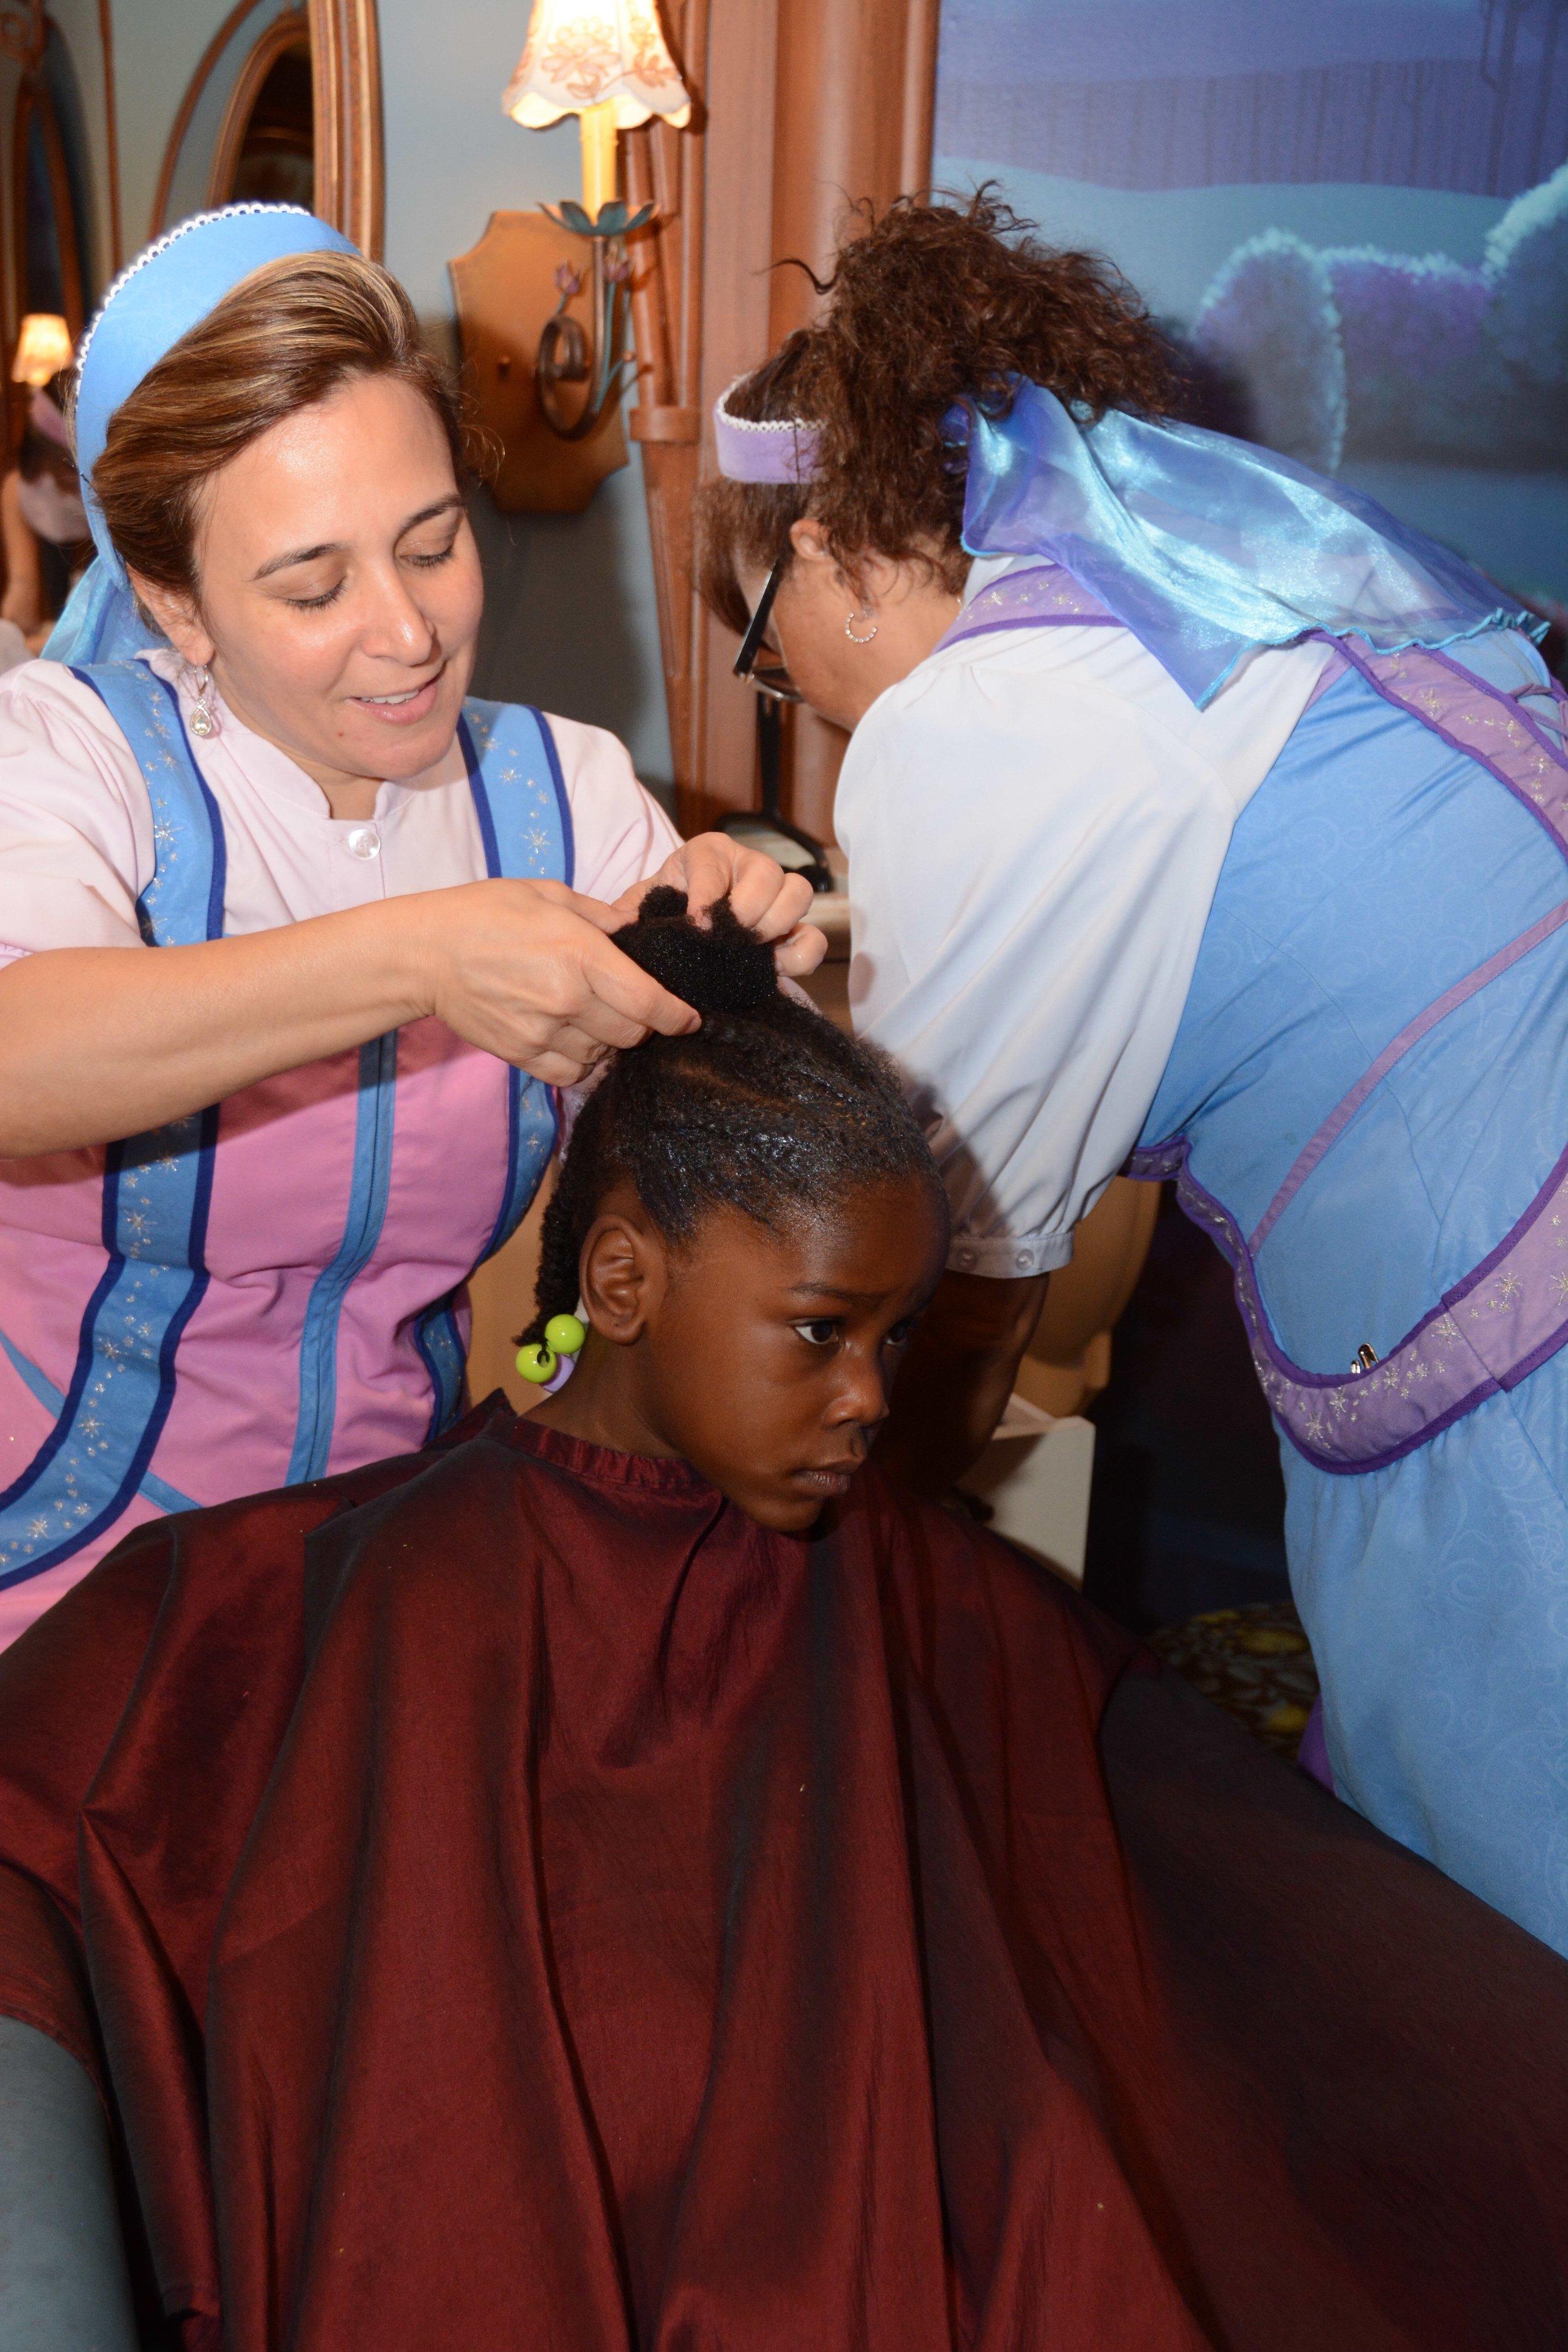 disney-bibbidi-bobbidi-boutique-little-black-girls-hair.jpg